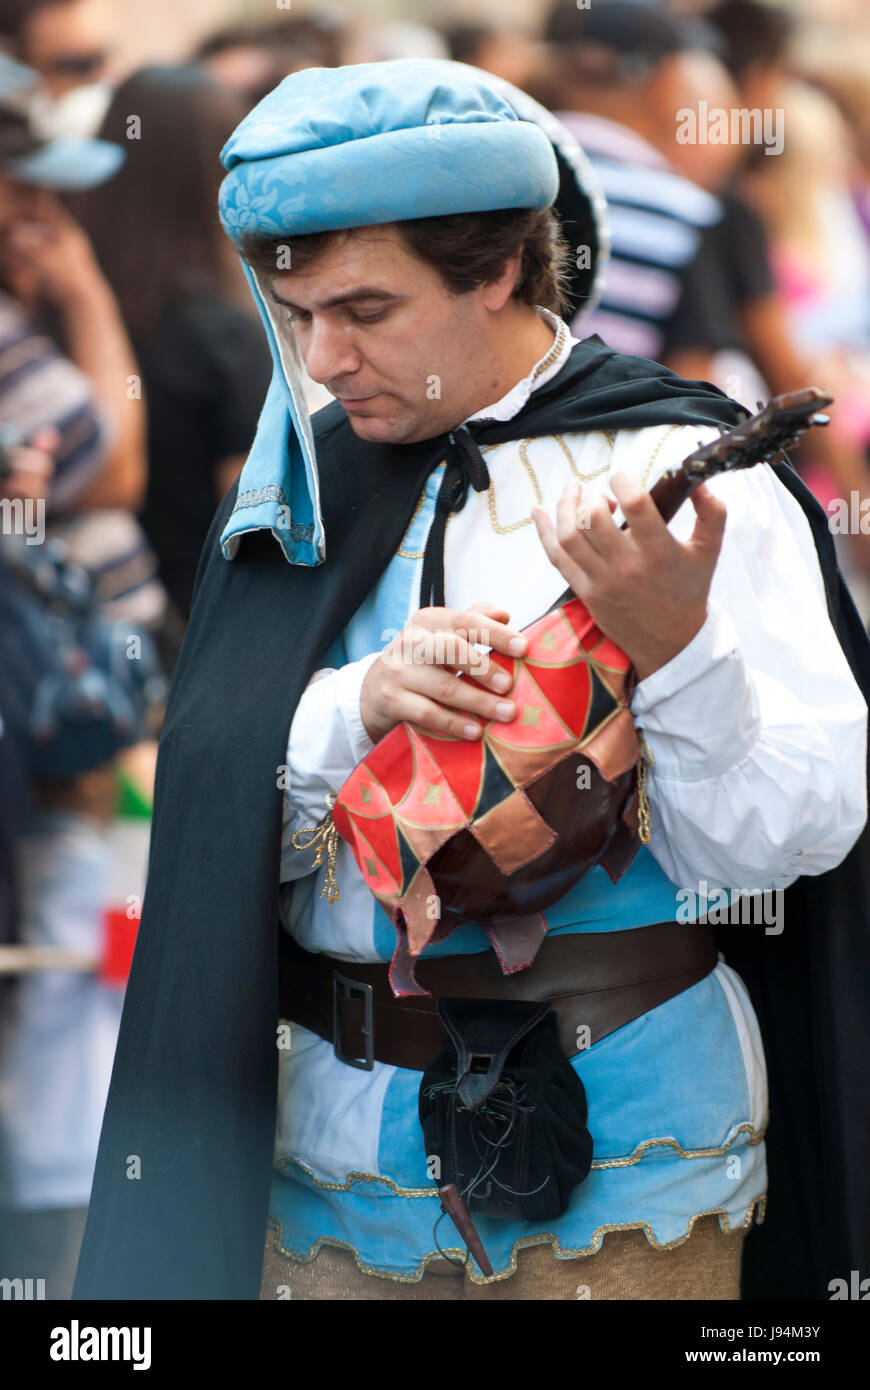 Mittelalterliche junger Mann alte Gitarre, laute parade del Palio. Stockbild